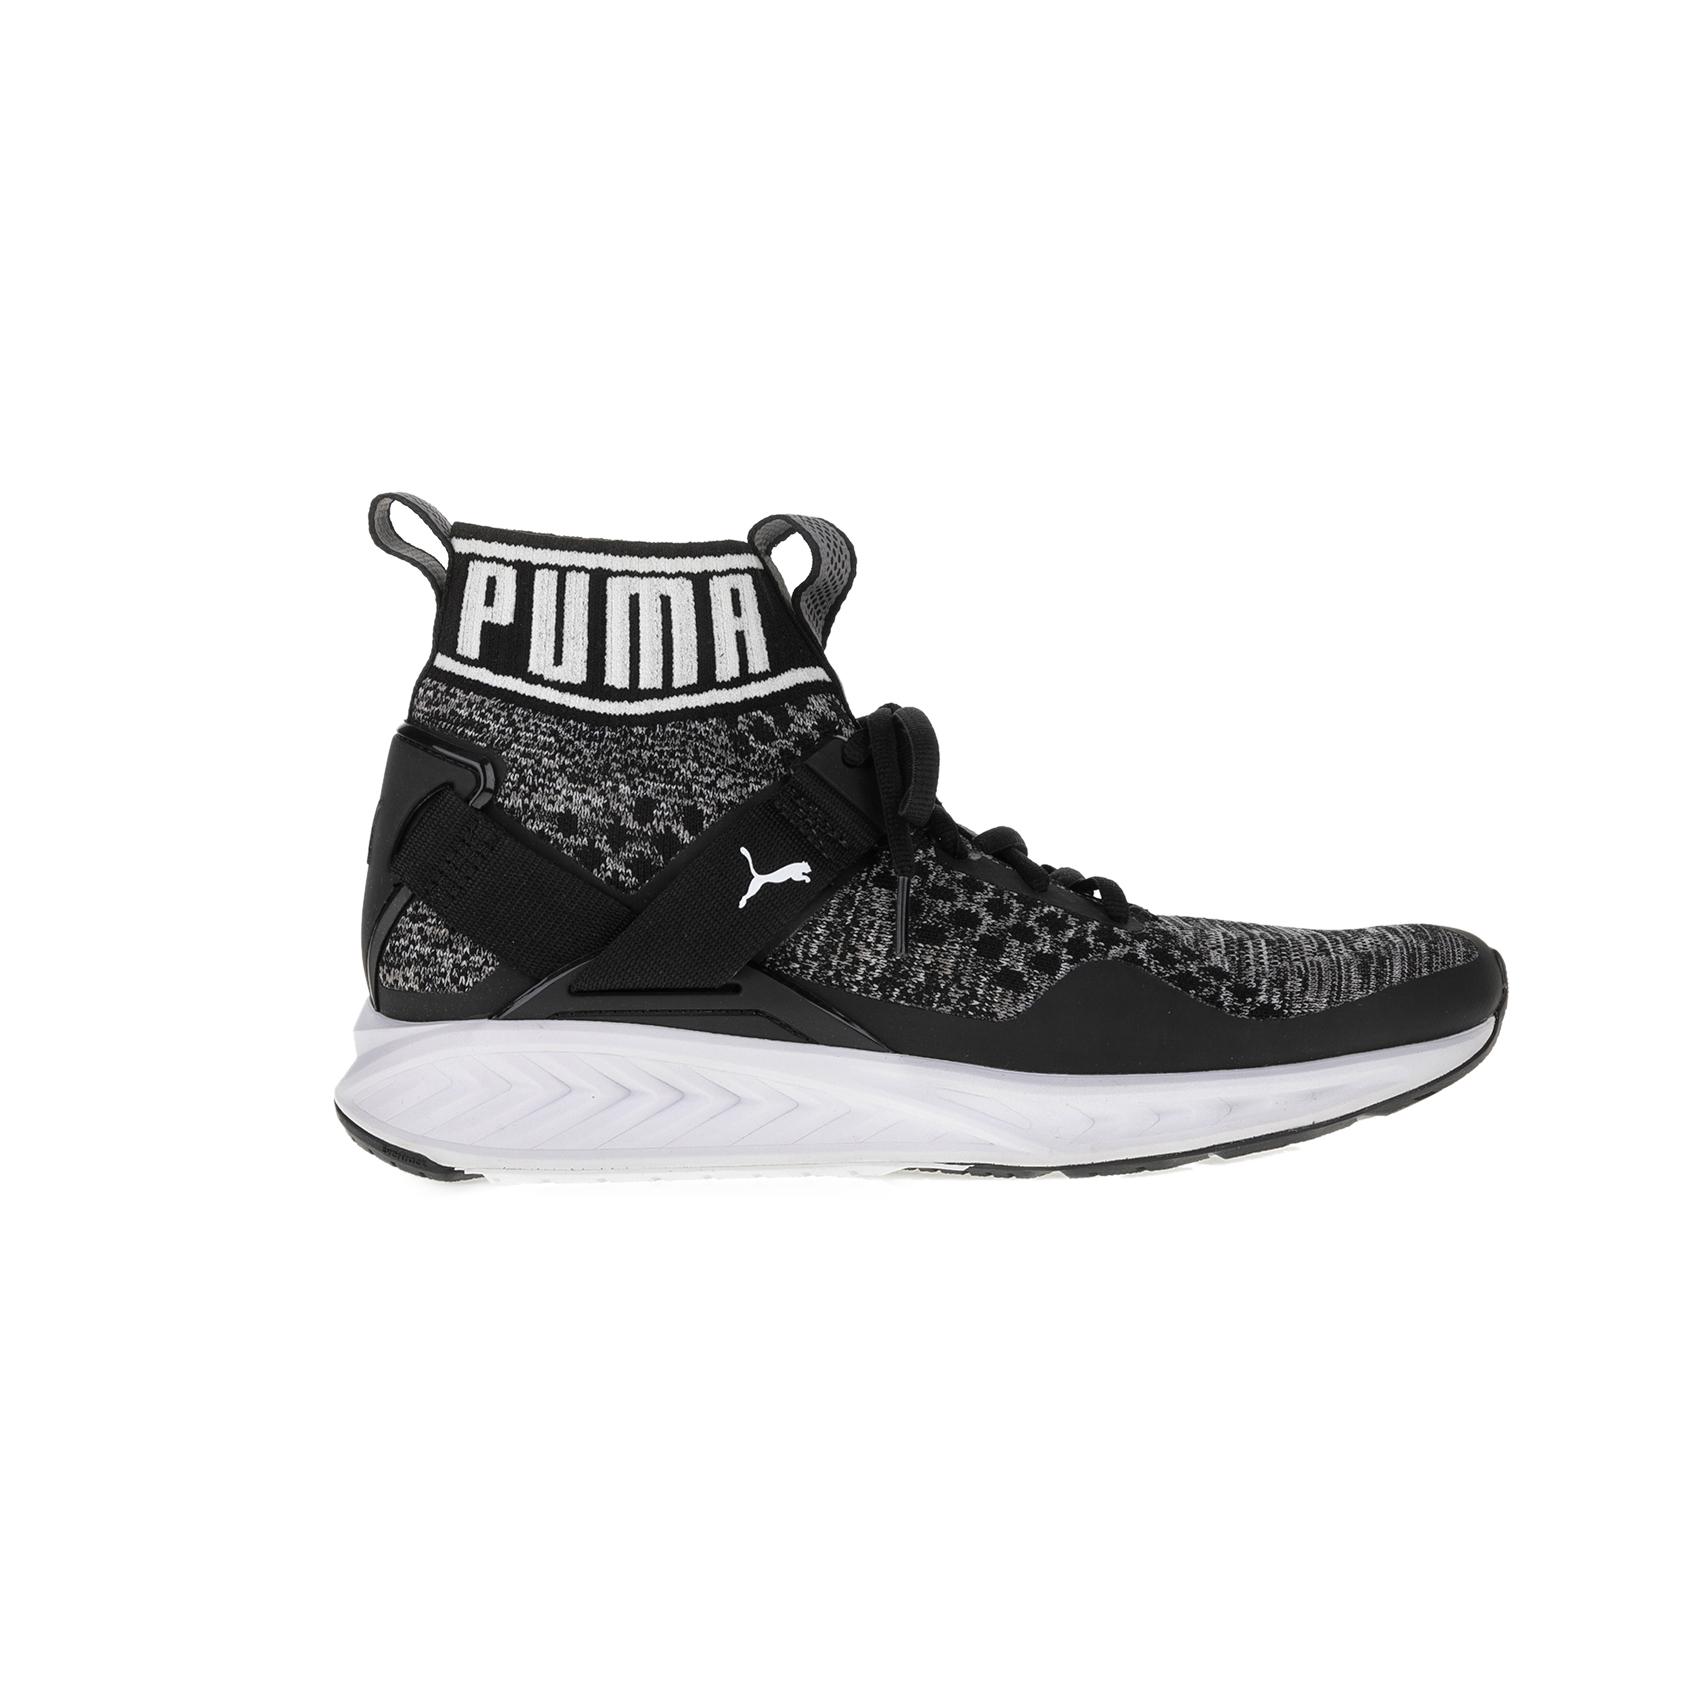 PUMA – Ανδρικά παπούτσια PUMA IGNITE evoKNIT μαύρα